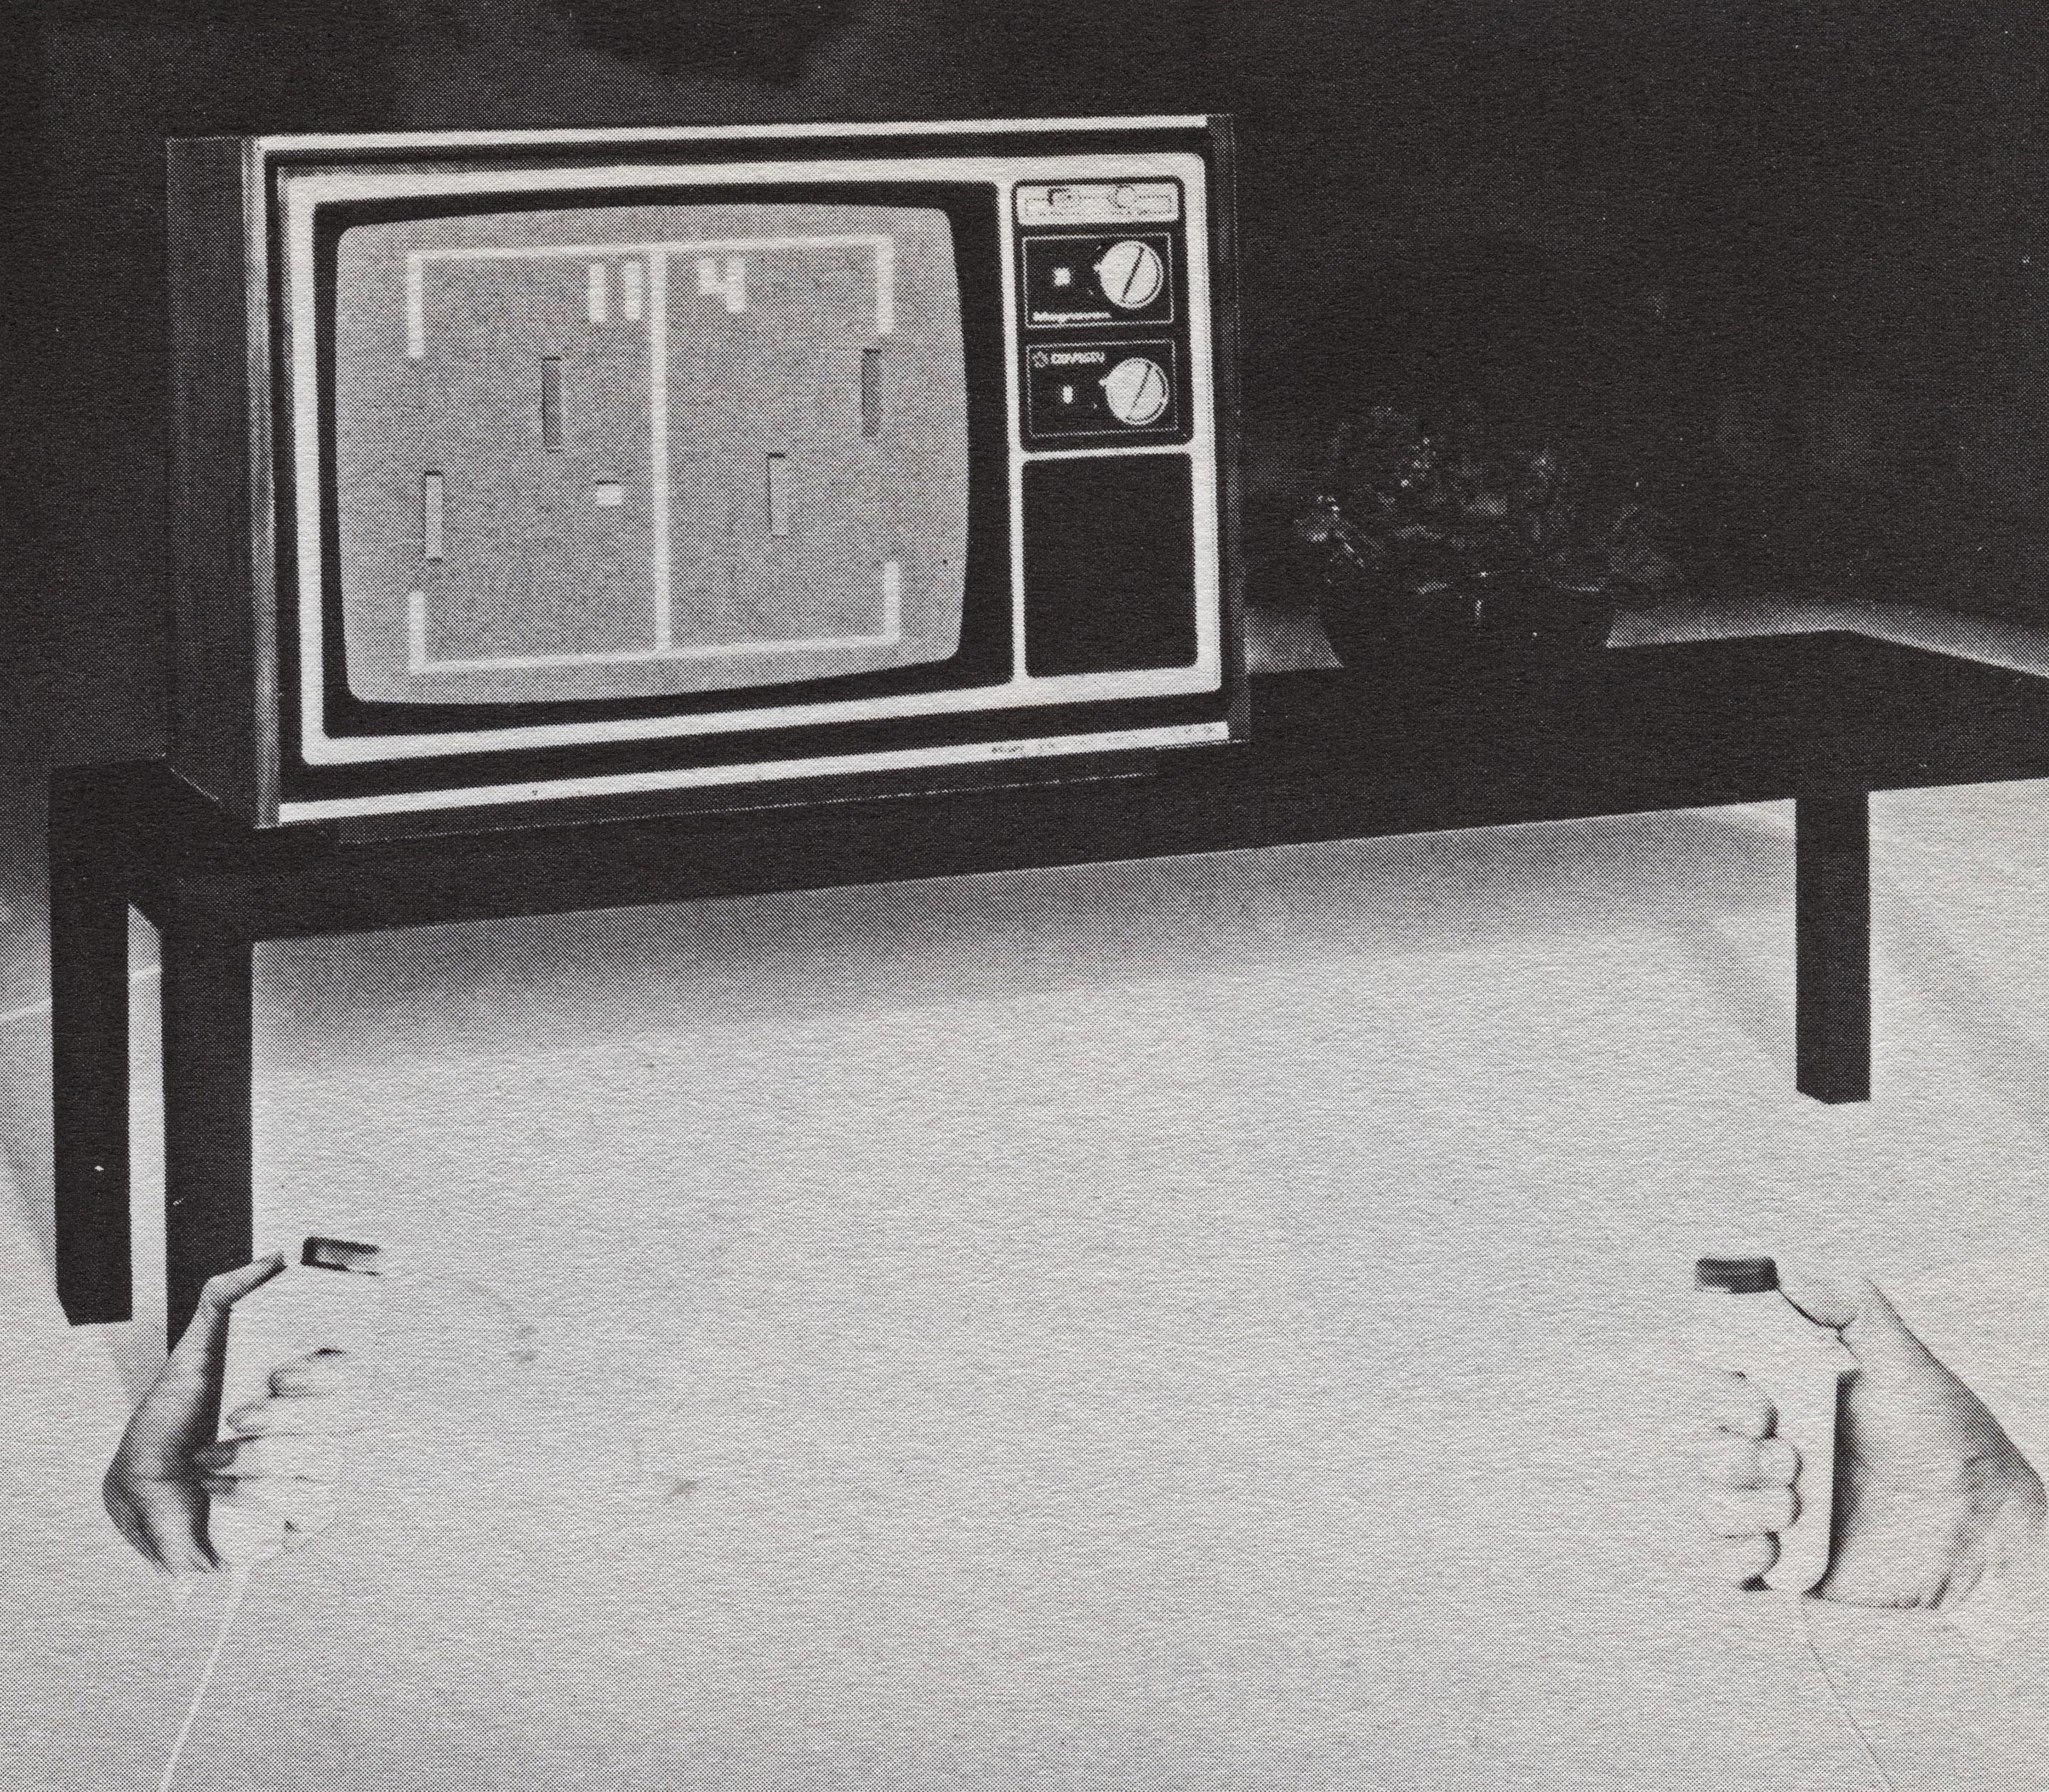 Magnavox 4305, a TV/home video game hybrid